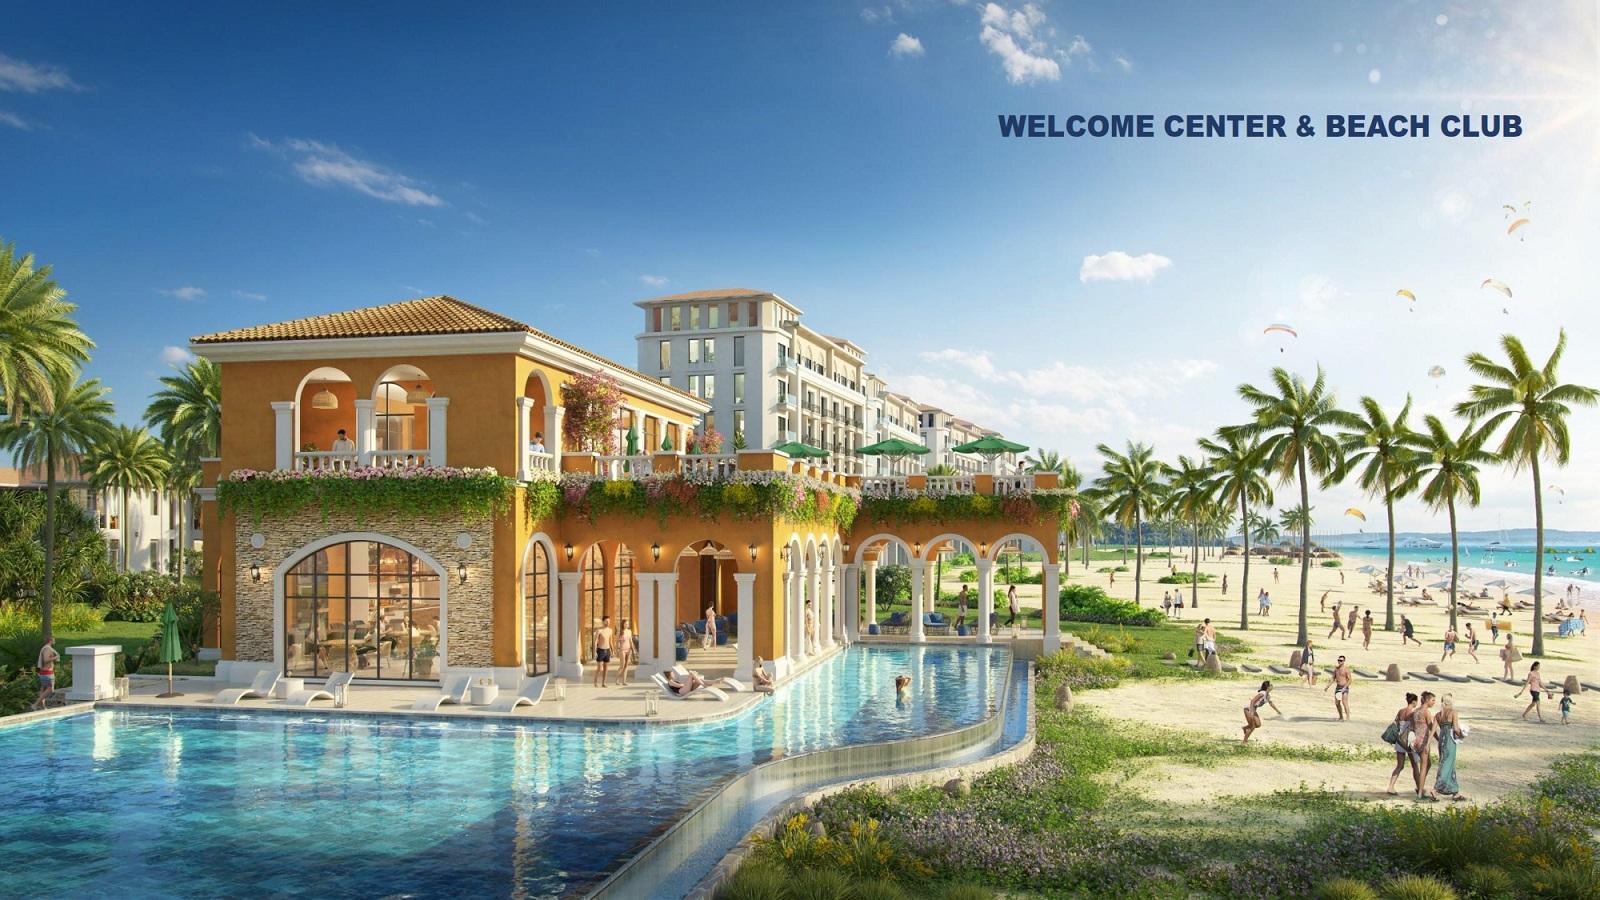 wellcome-center-habana-island